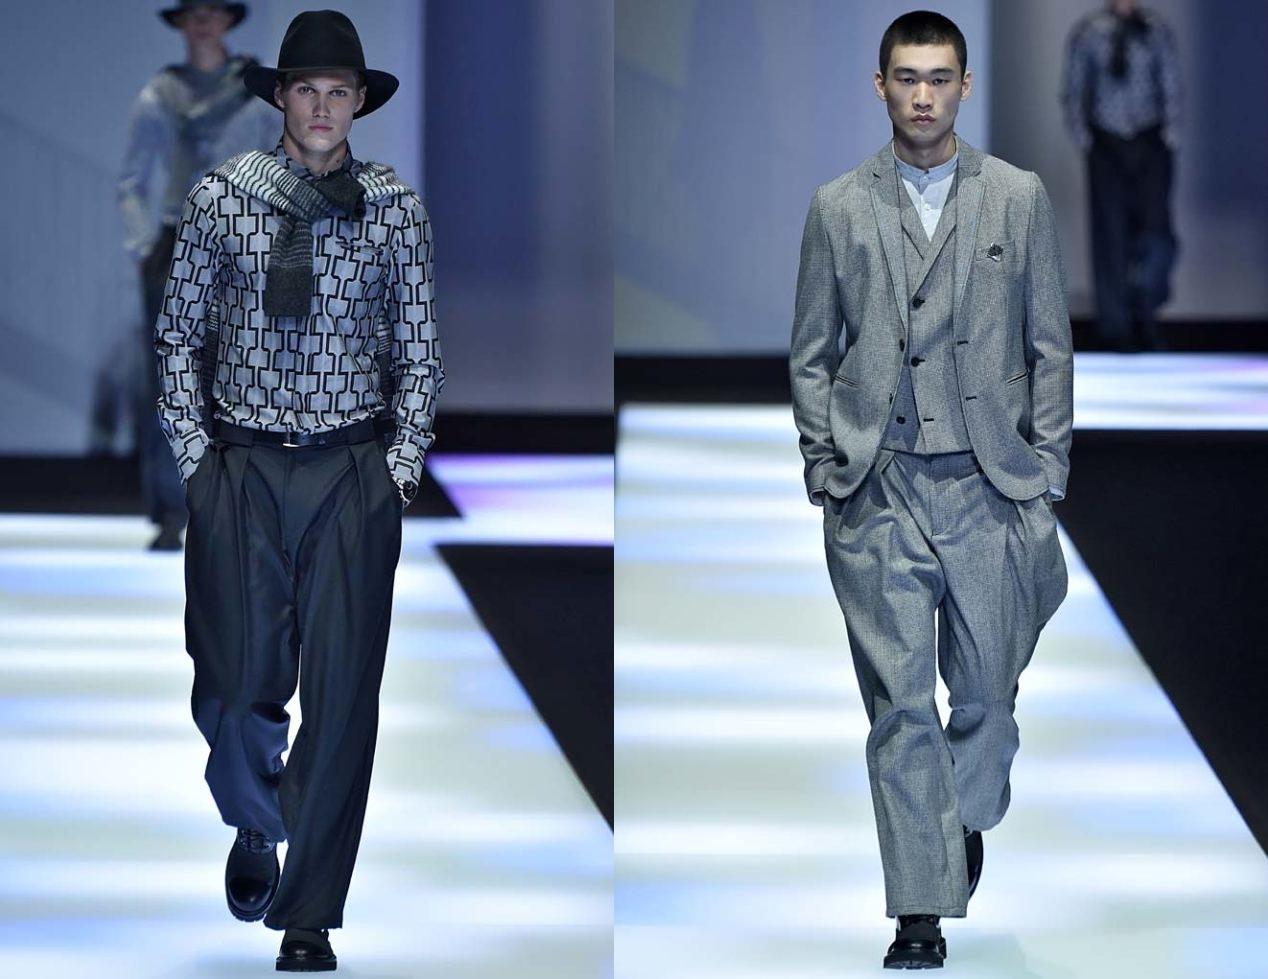 Emporio Armani Milan Menswear Fall Winter 2017, desfile masculino, tendencia masculina, inverno 2017, winter 2018, alex cursino, blog de moda, moda sem censura (3)-horz